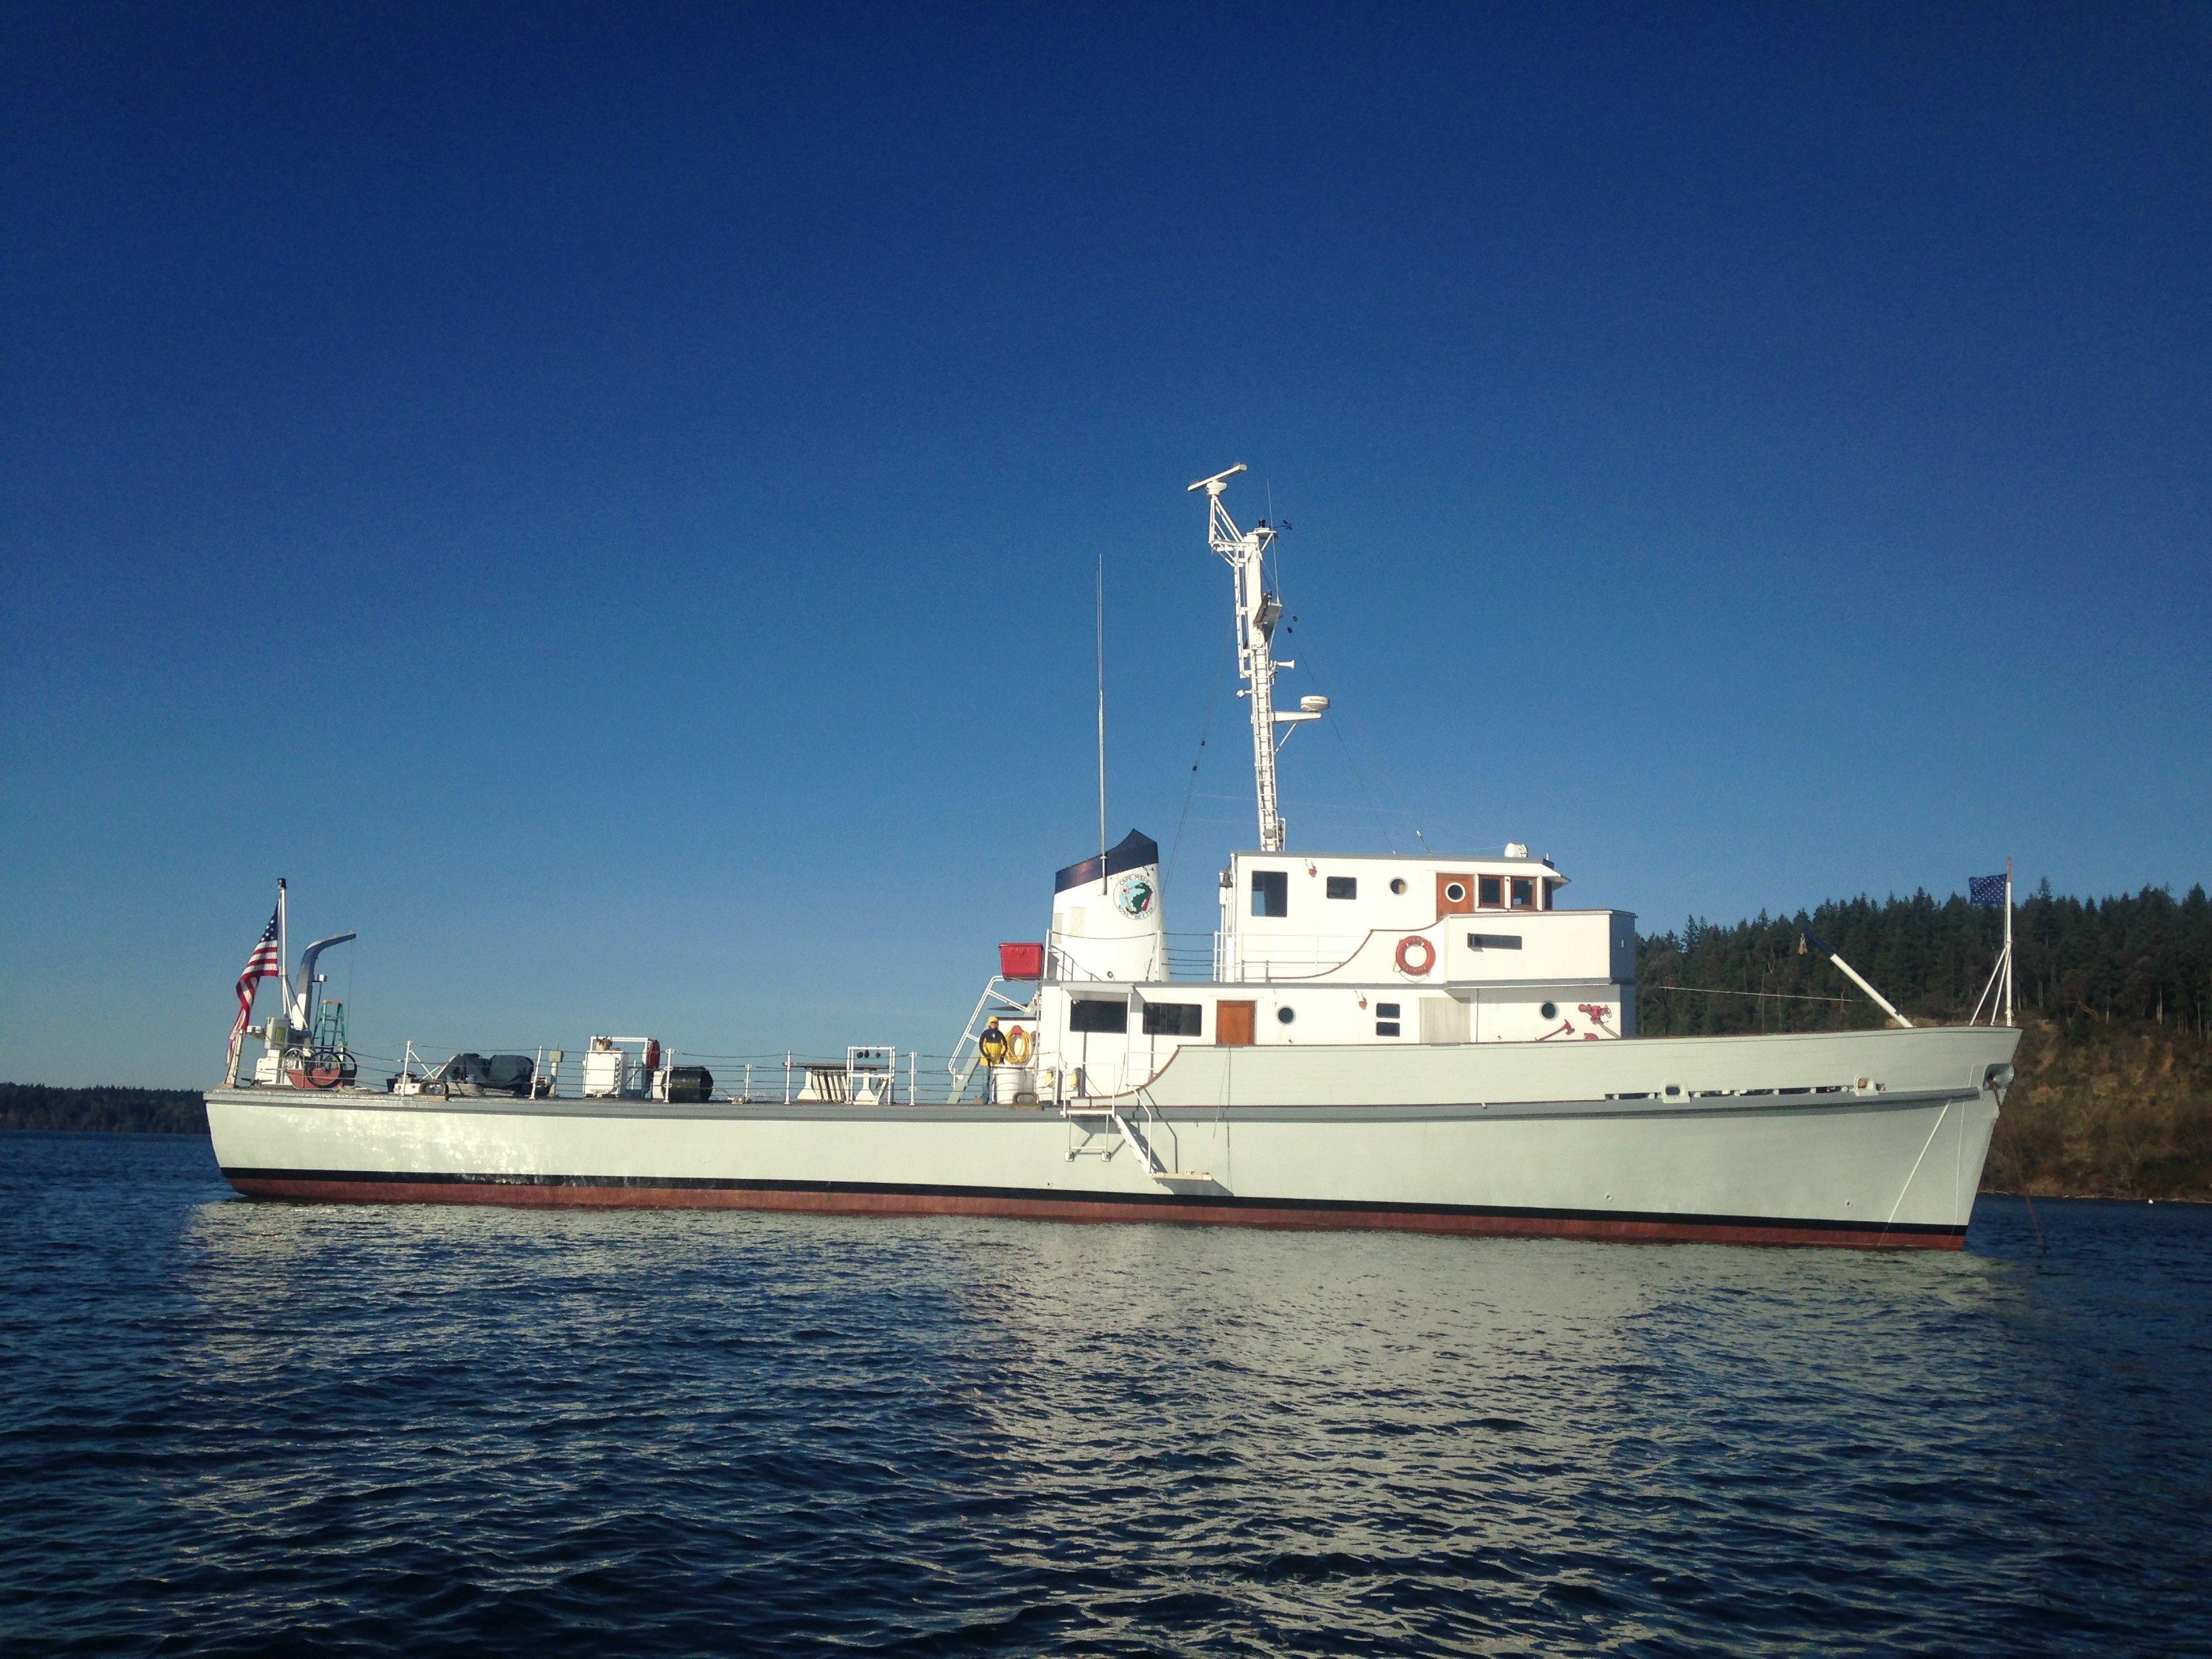 Yacht broker olympia wa